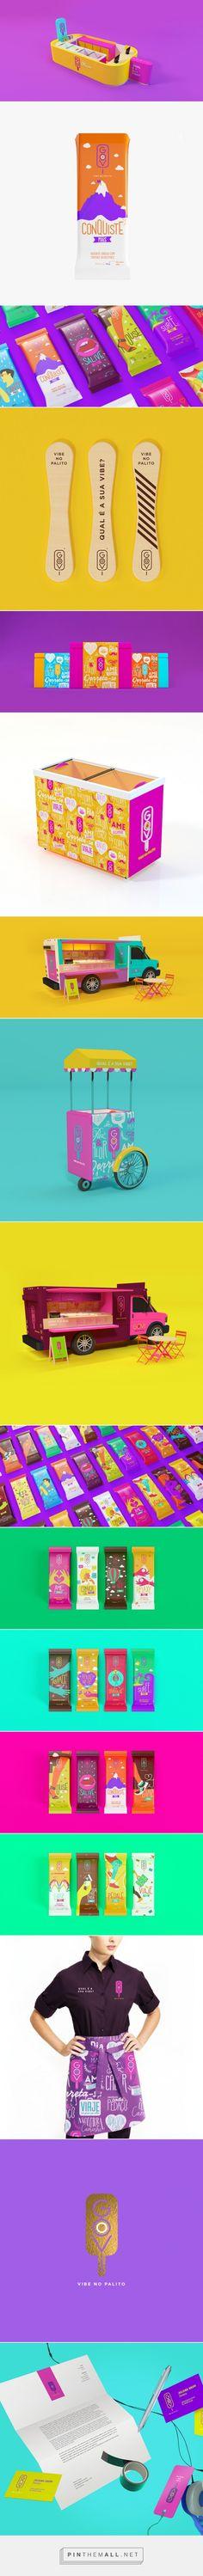 Goovi #BrazilianPaletas #packaging designed by Isabela Rodrigues - http://www.packagingoftheworld.com/2015/06/goovi.html